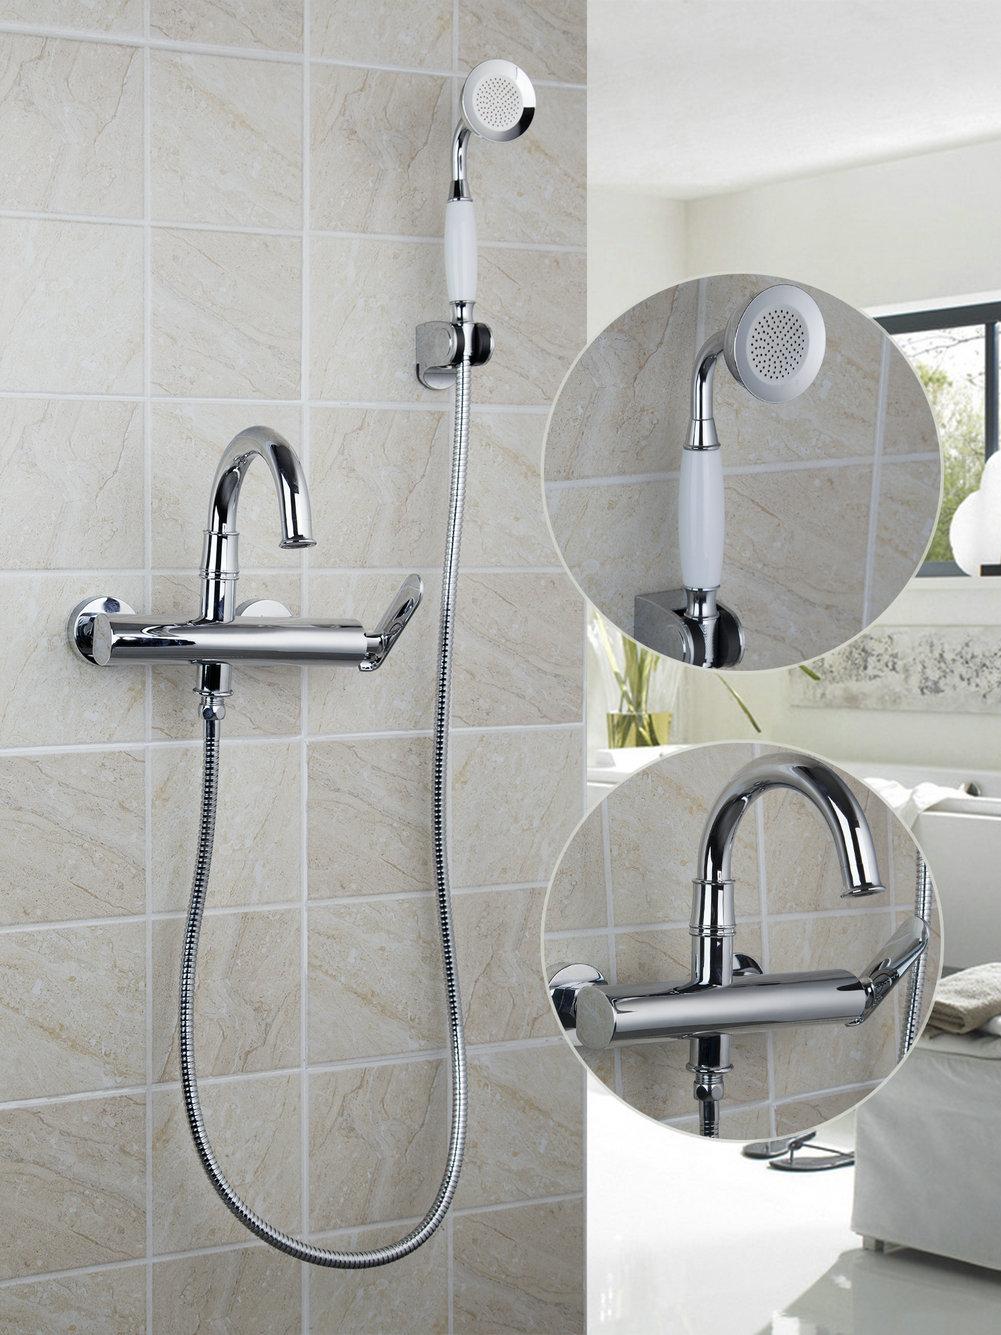 Wall Mount Chrome//Gold Bathroom Tub Spout Hand Held Shower Mixer Faucet Taps Set